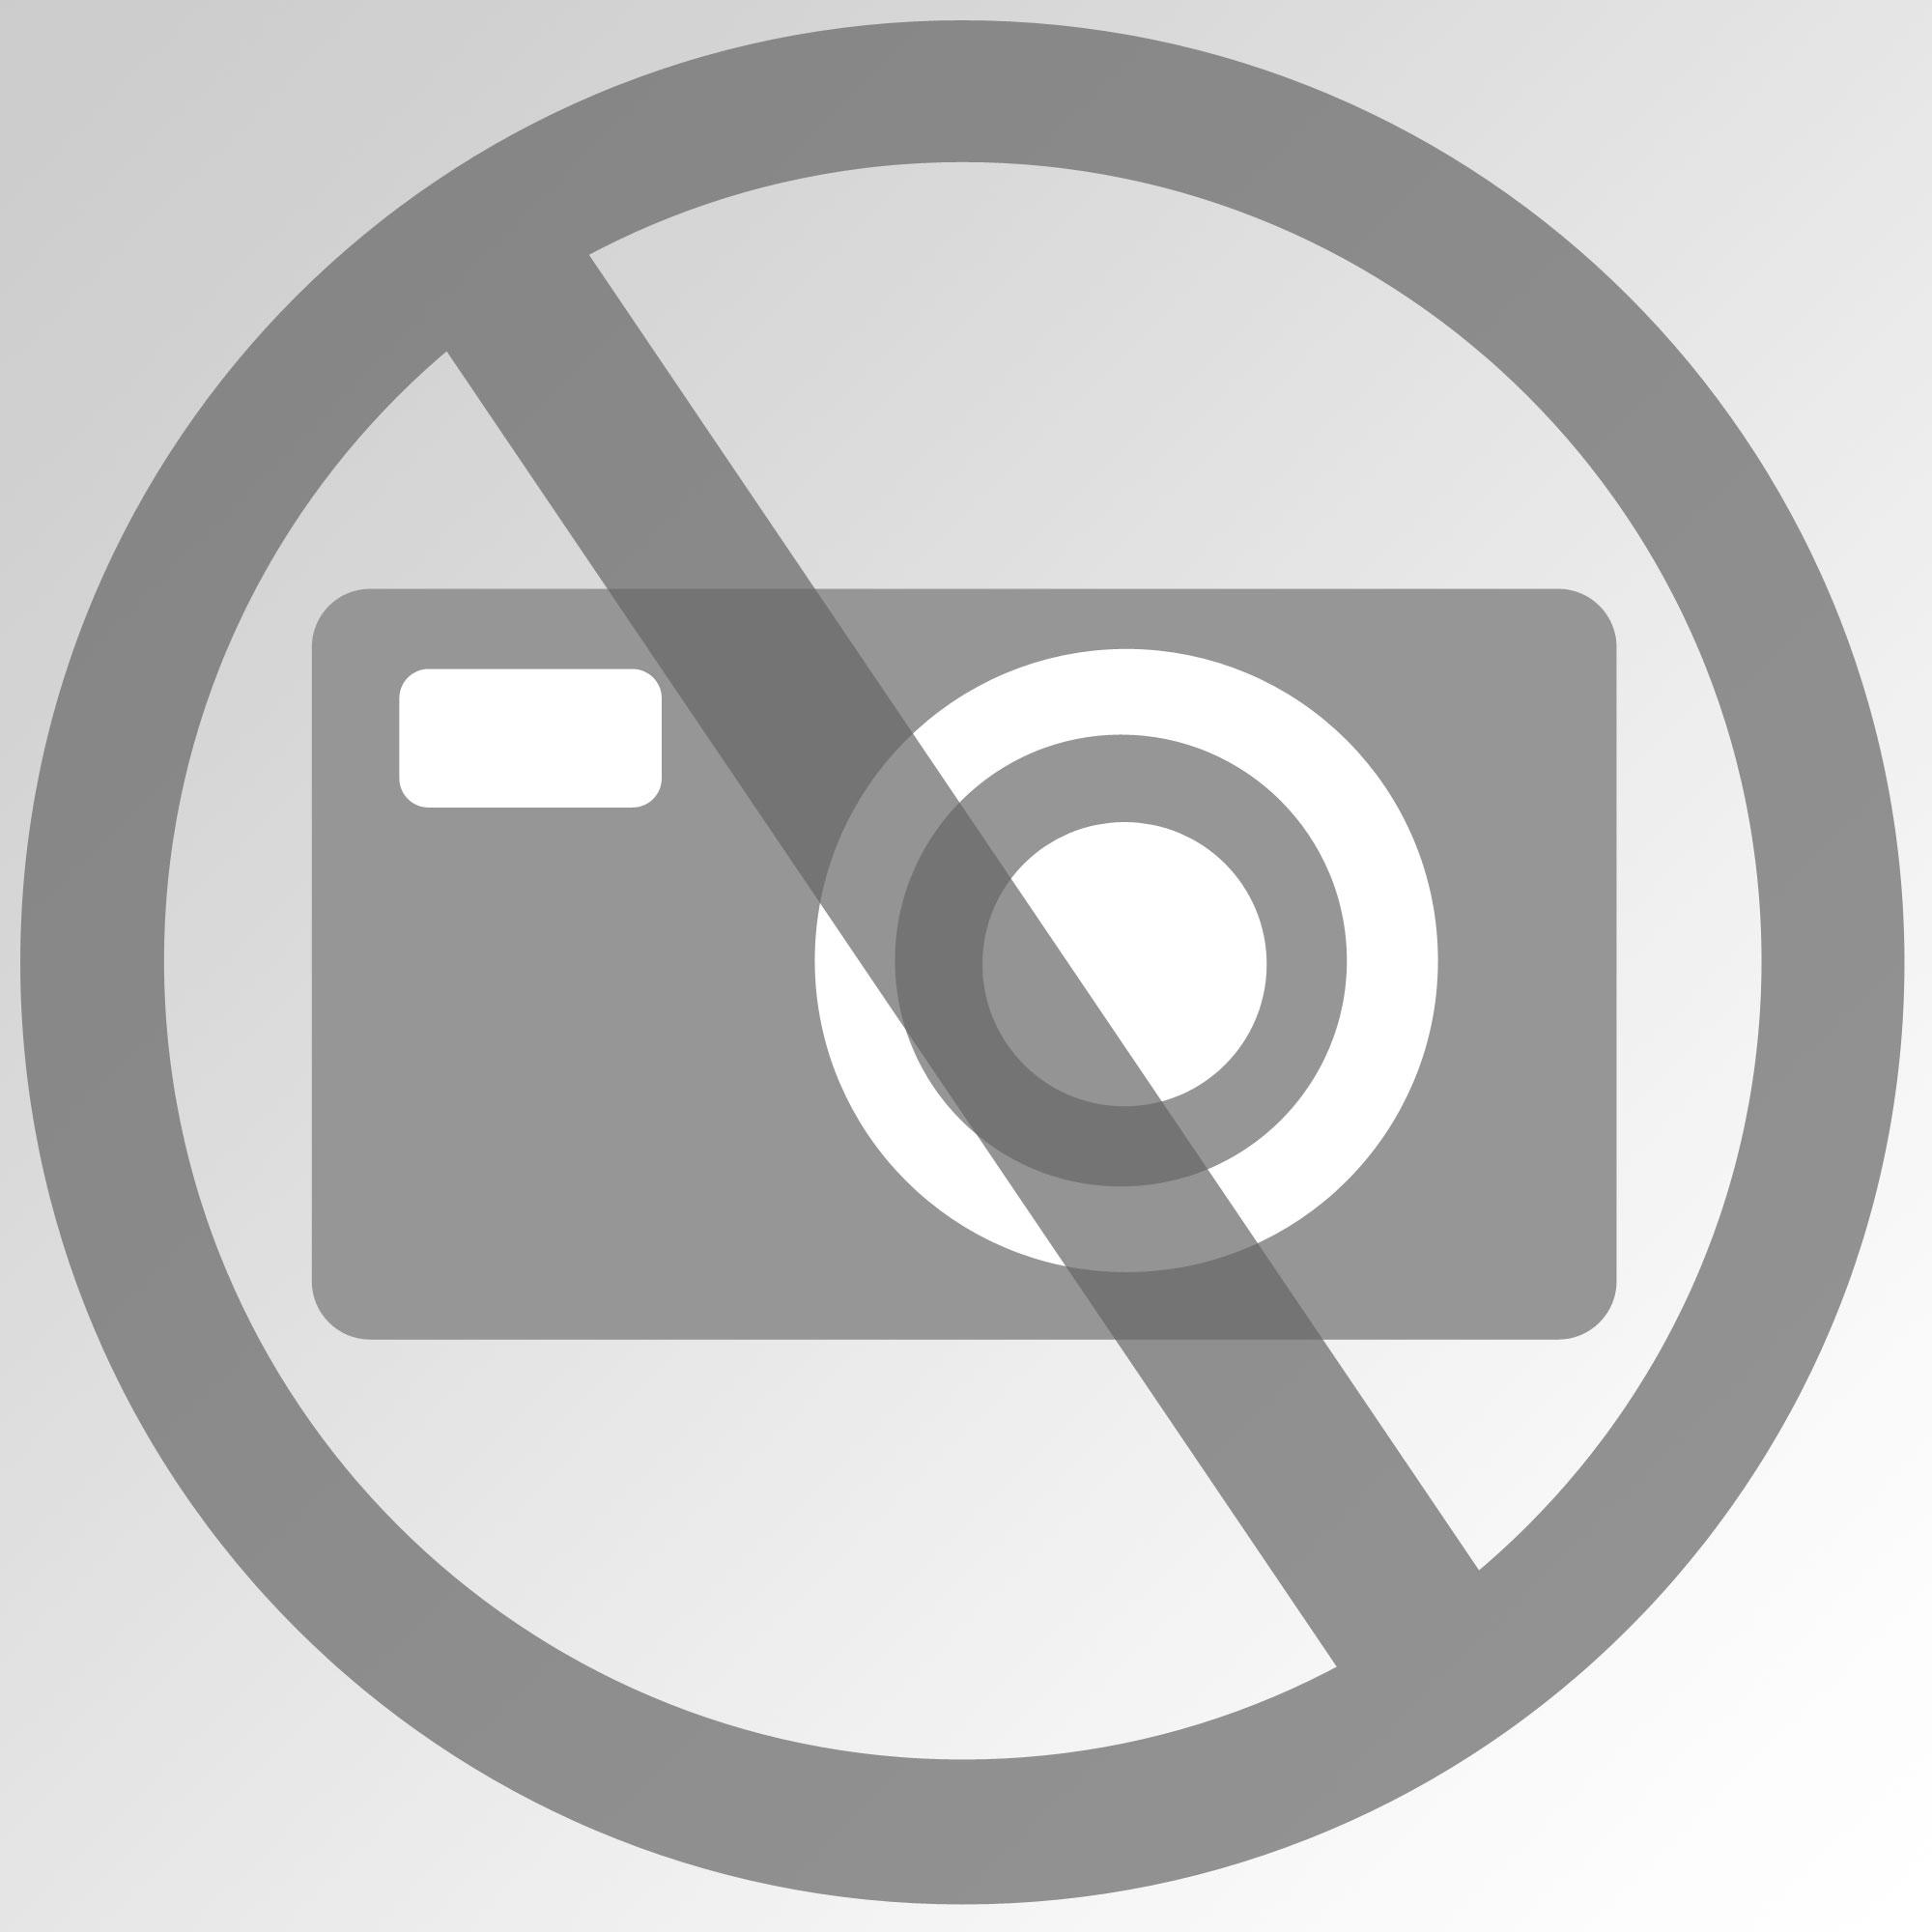 Desi StandART Mini Desinfektionssäule, Edelstahl